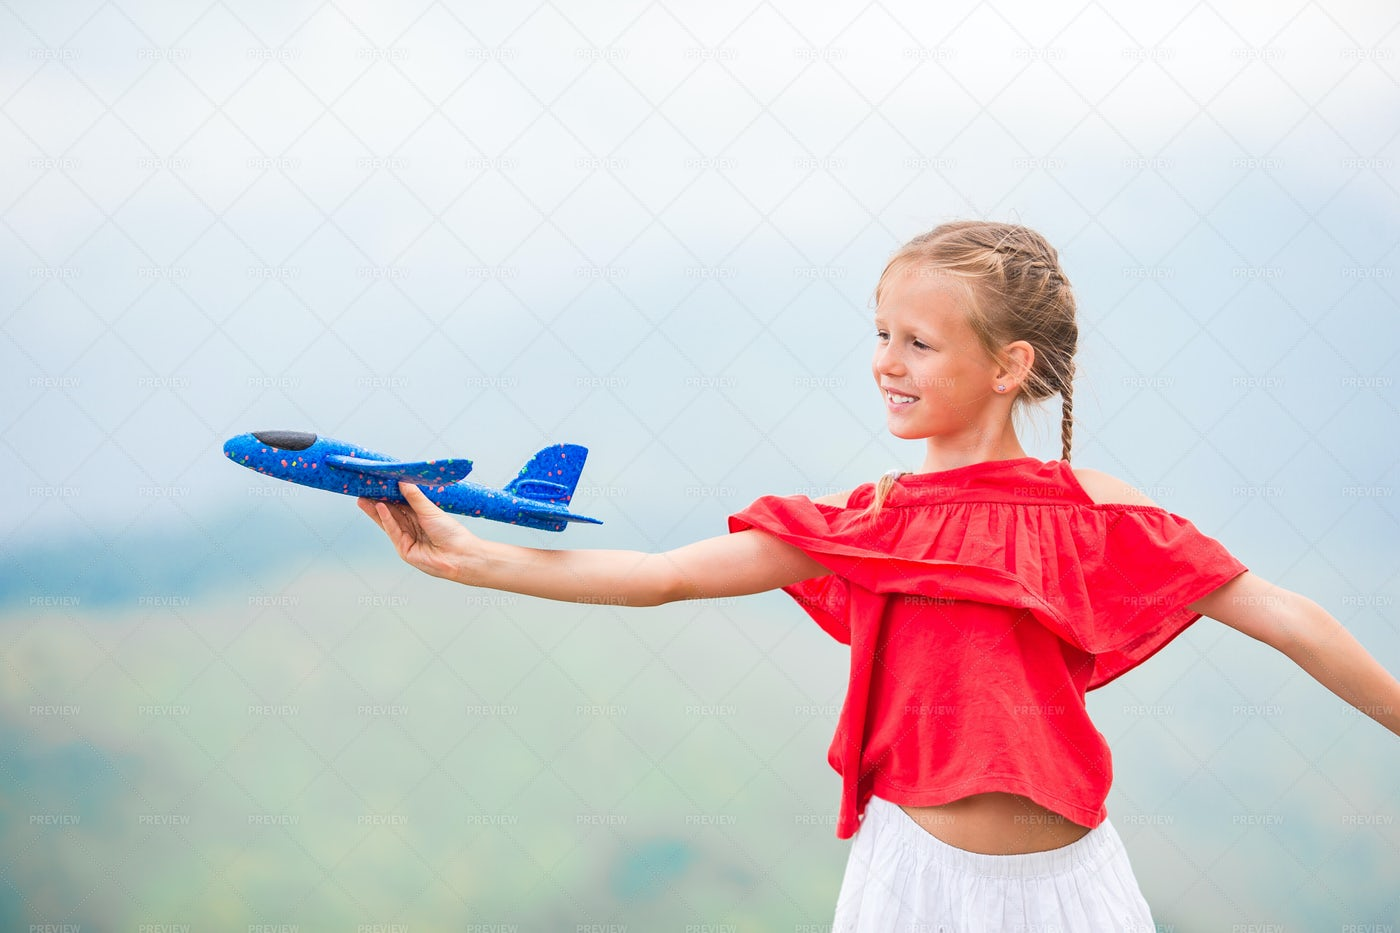 Girl With Toy Plane: Stock Photos